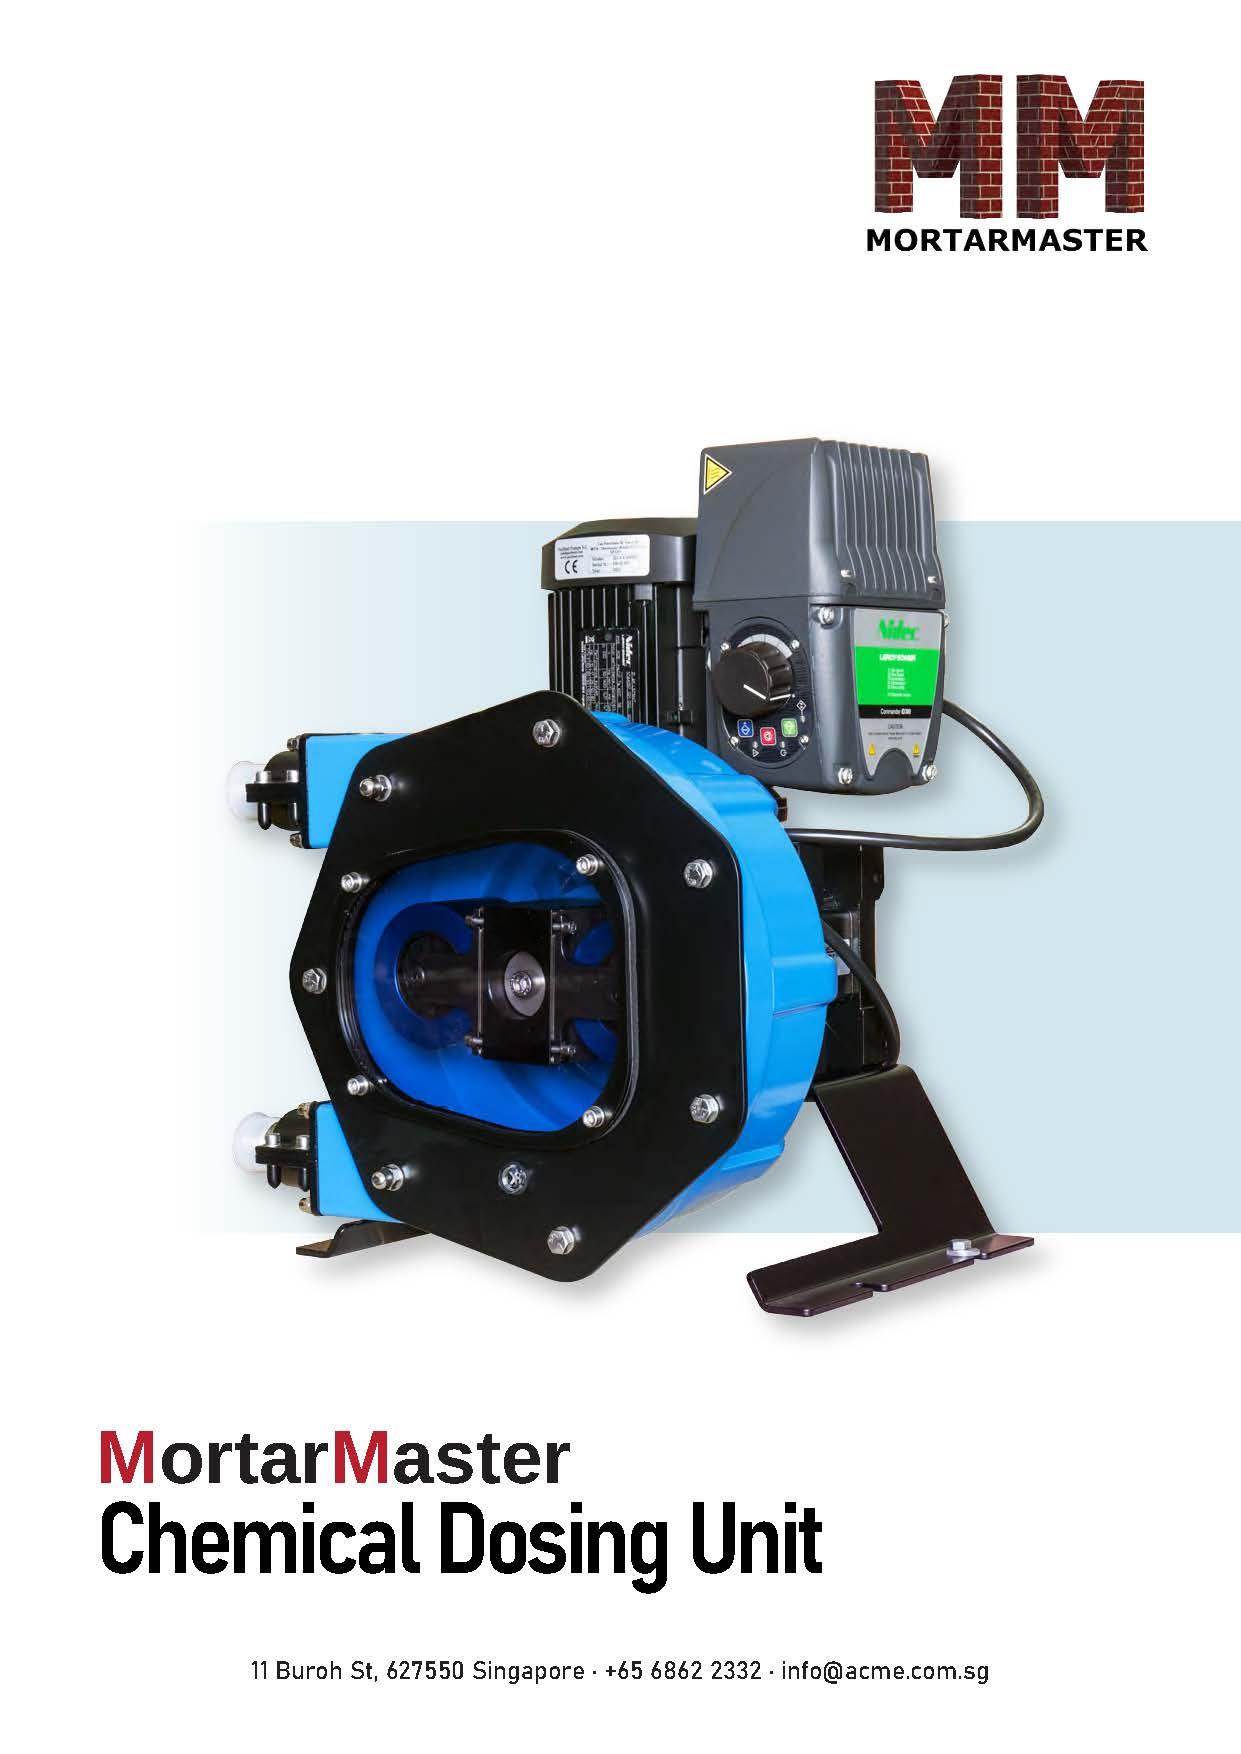 Mortar Master Chemical Dosing Unit Brochure